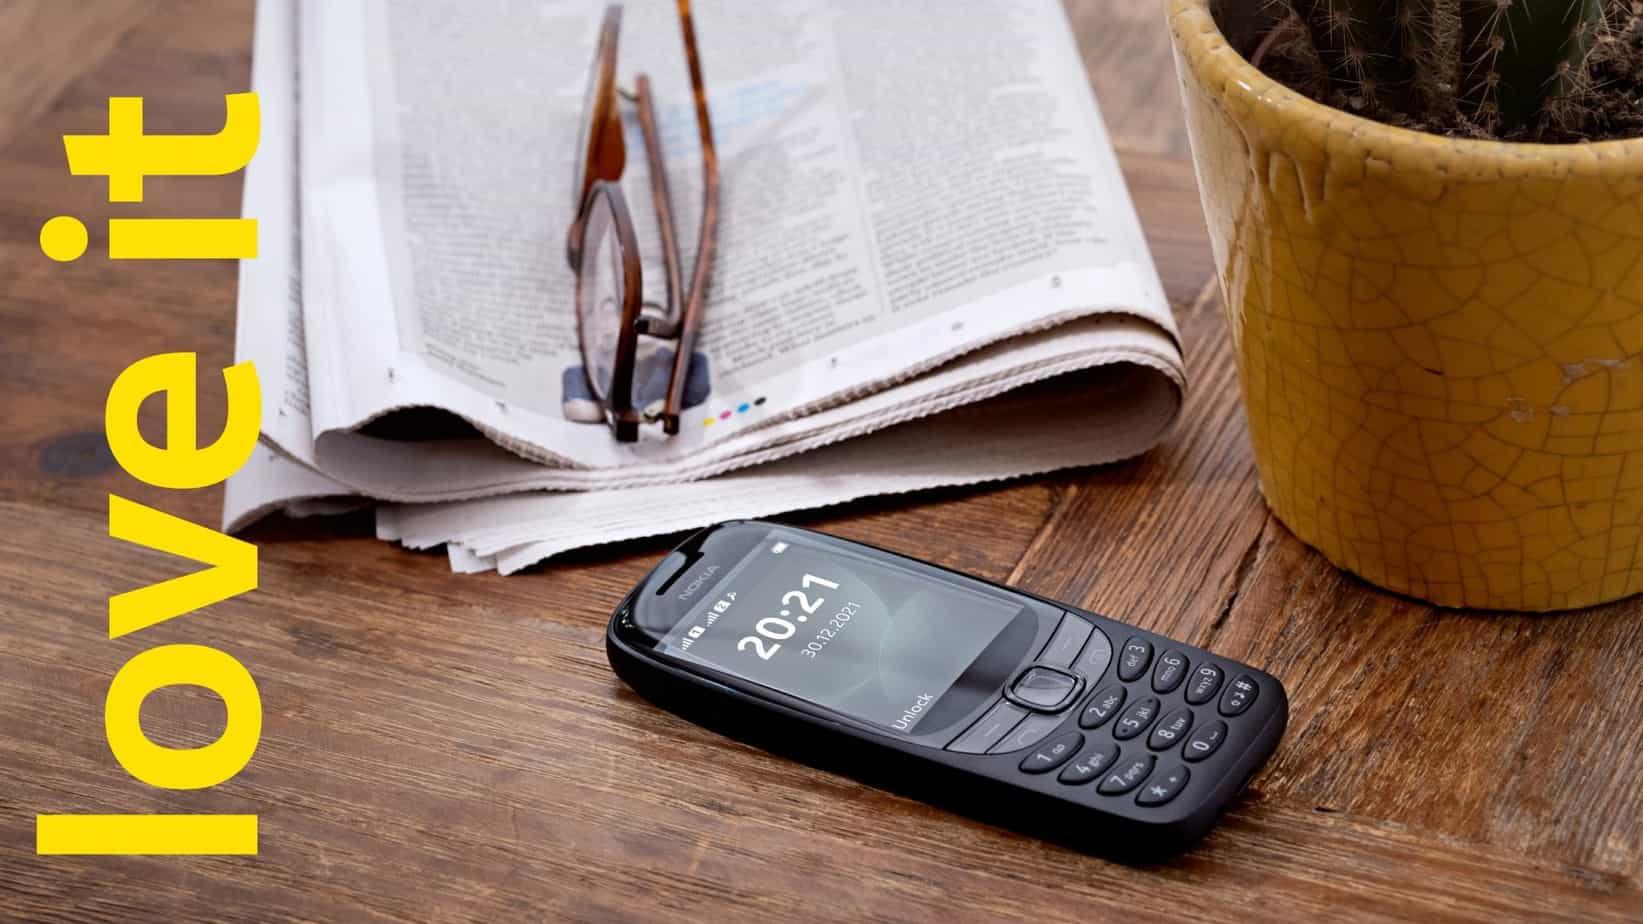 Le Nokia 6310 2021 sortira en aout 2021